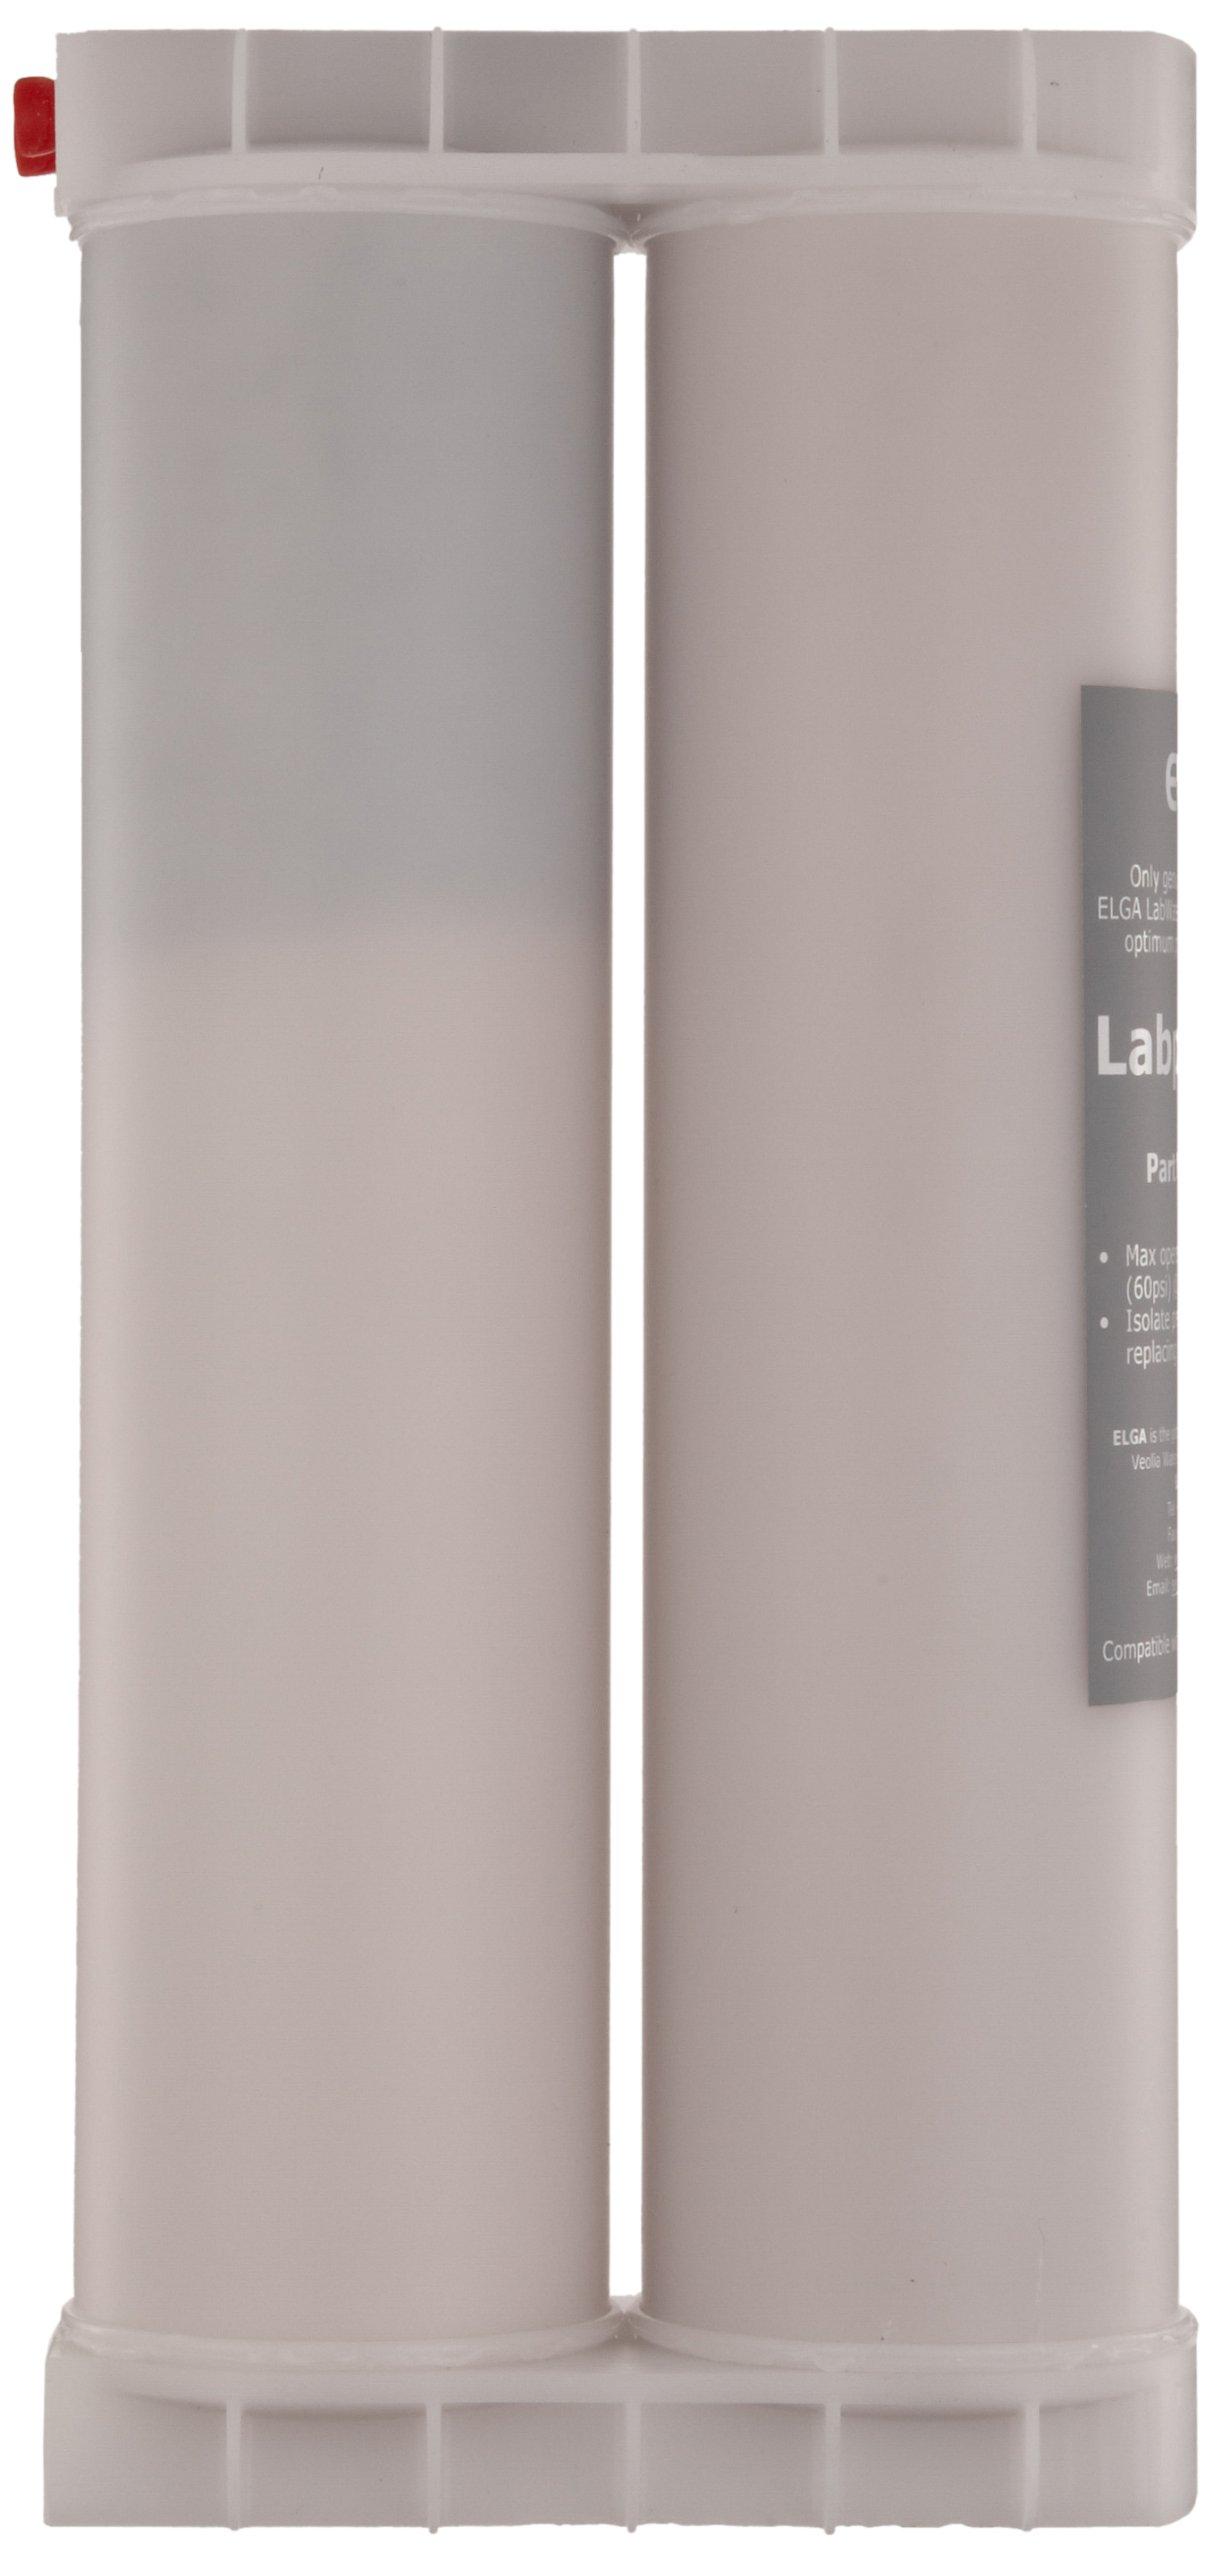 Elga LC186 Labpure S5 Purification Cartridge, For Purelab Classic